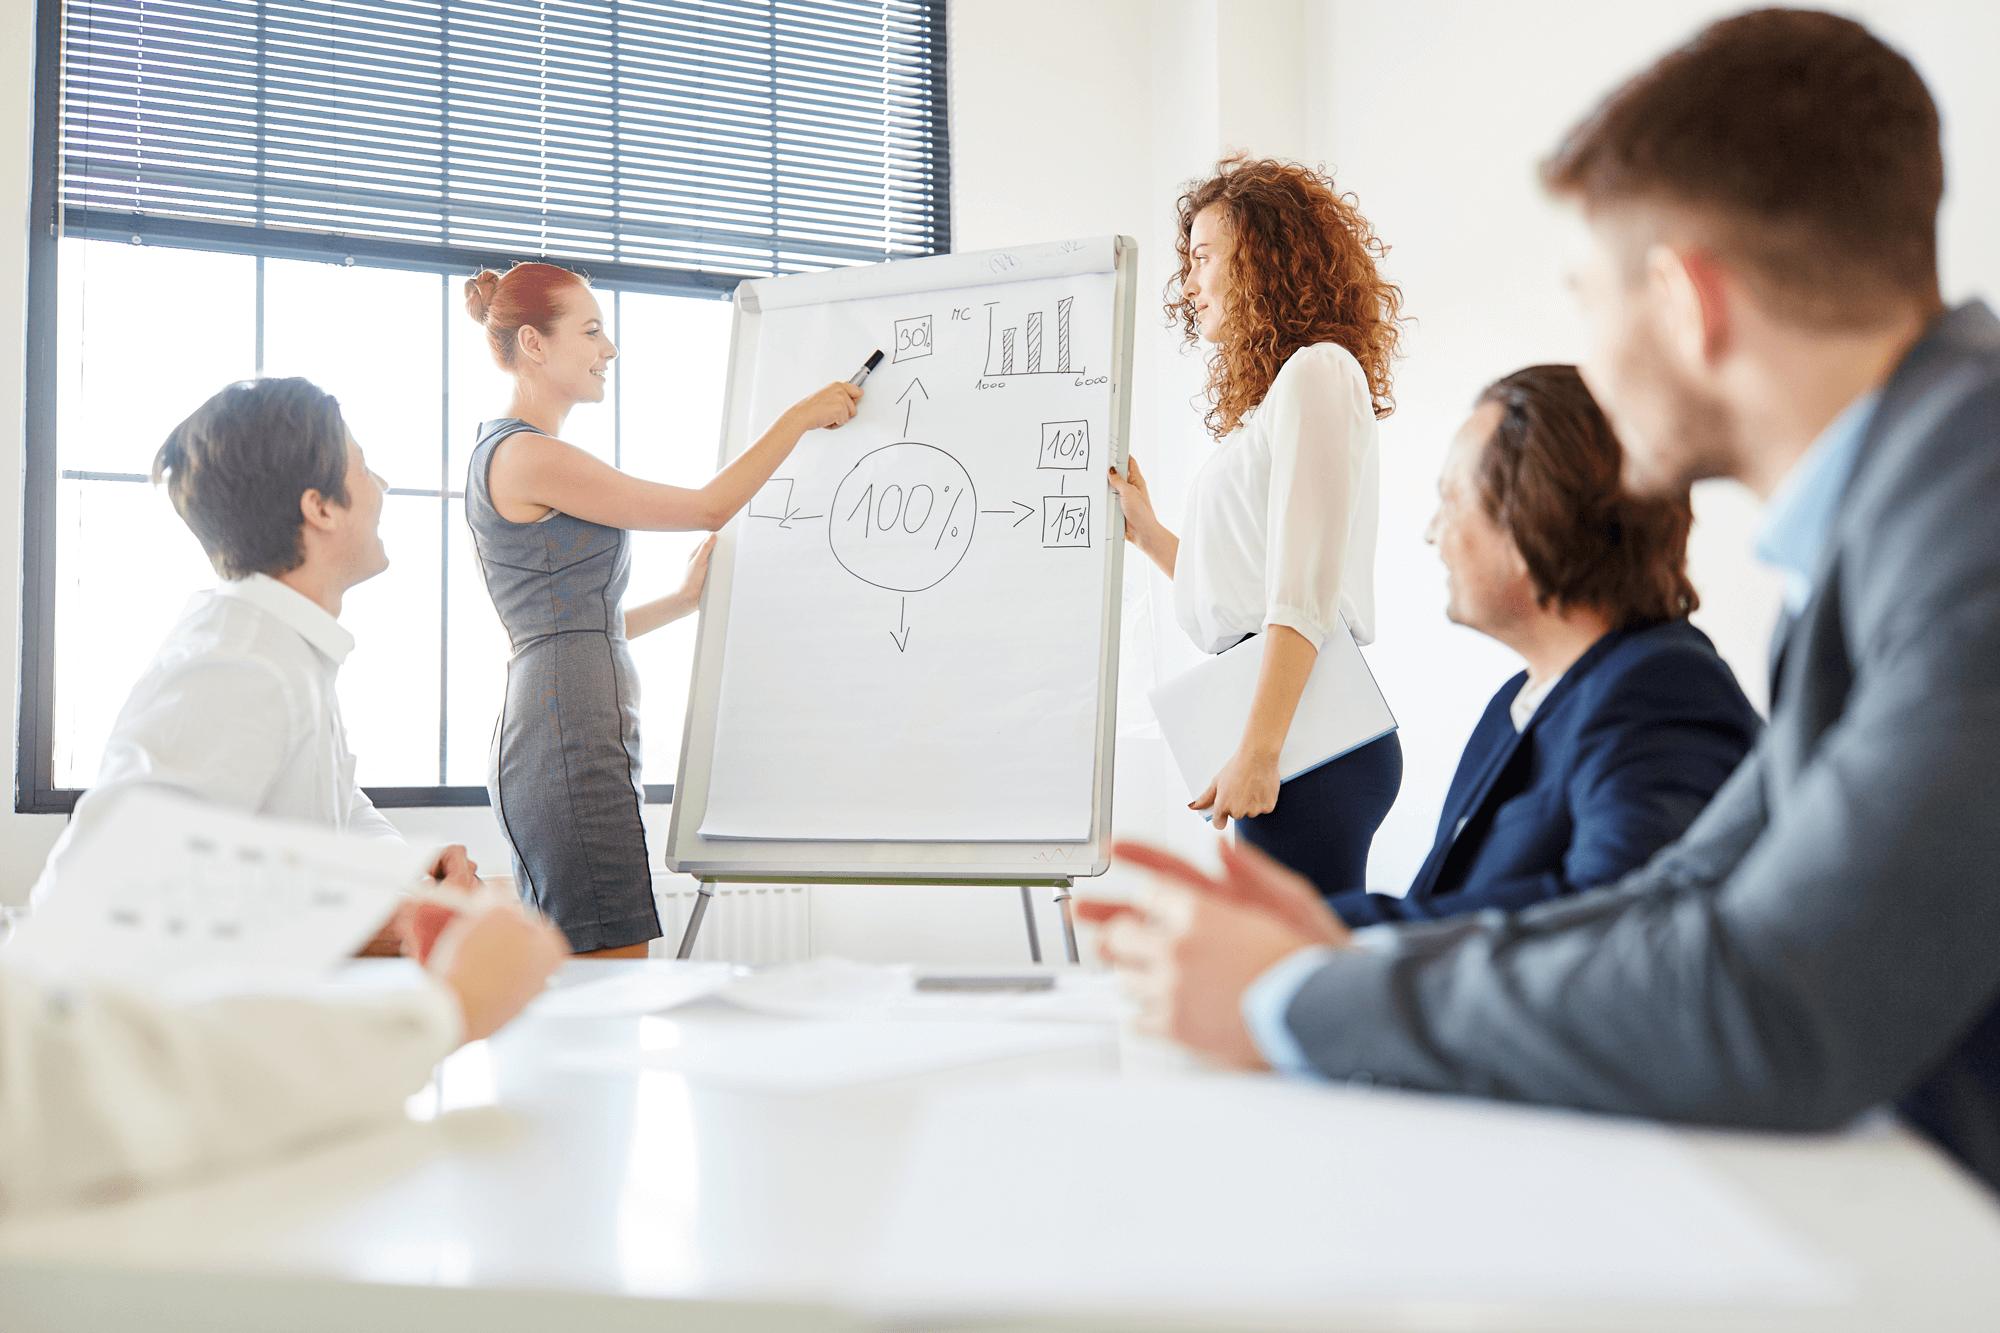 Strategie   Datagedreven werken   Bedrijfsstrategie   5 stappen